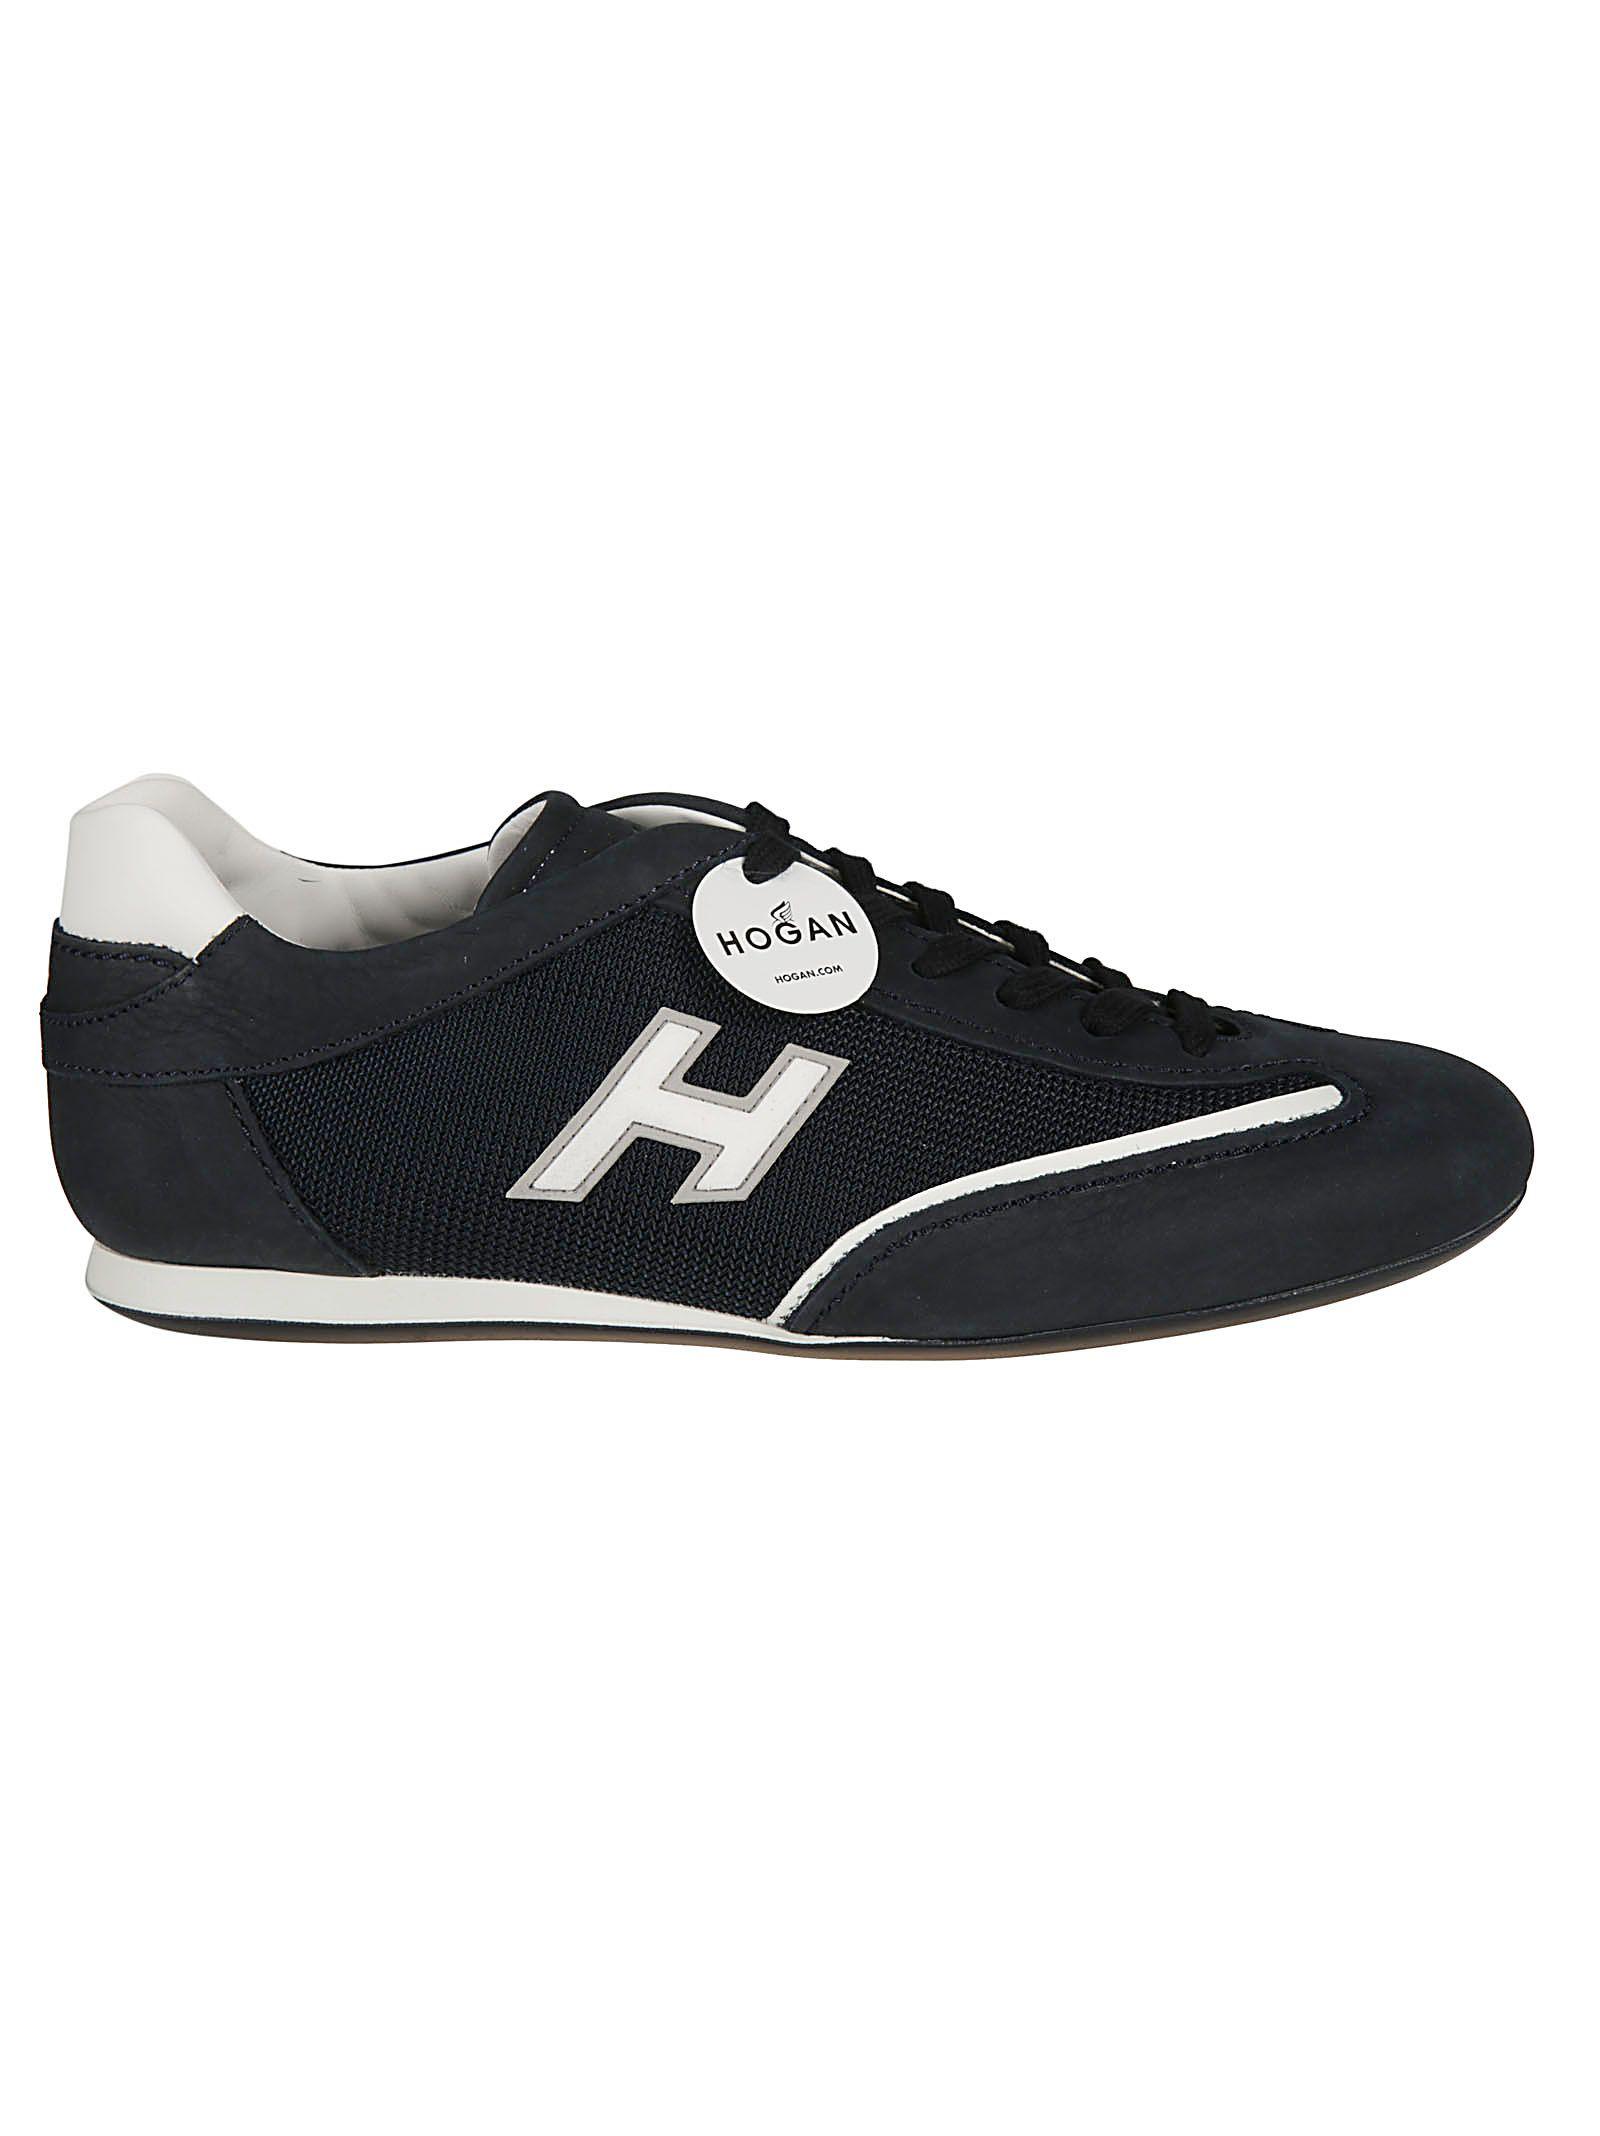 Hogan Olympia Sneakers In Z Blu/blu Denim Scuro/bianco   ModeSens